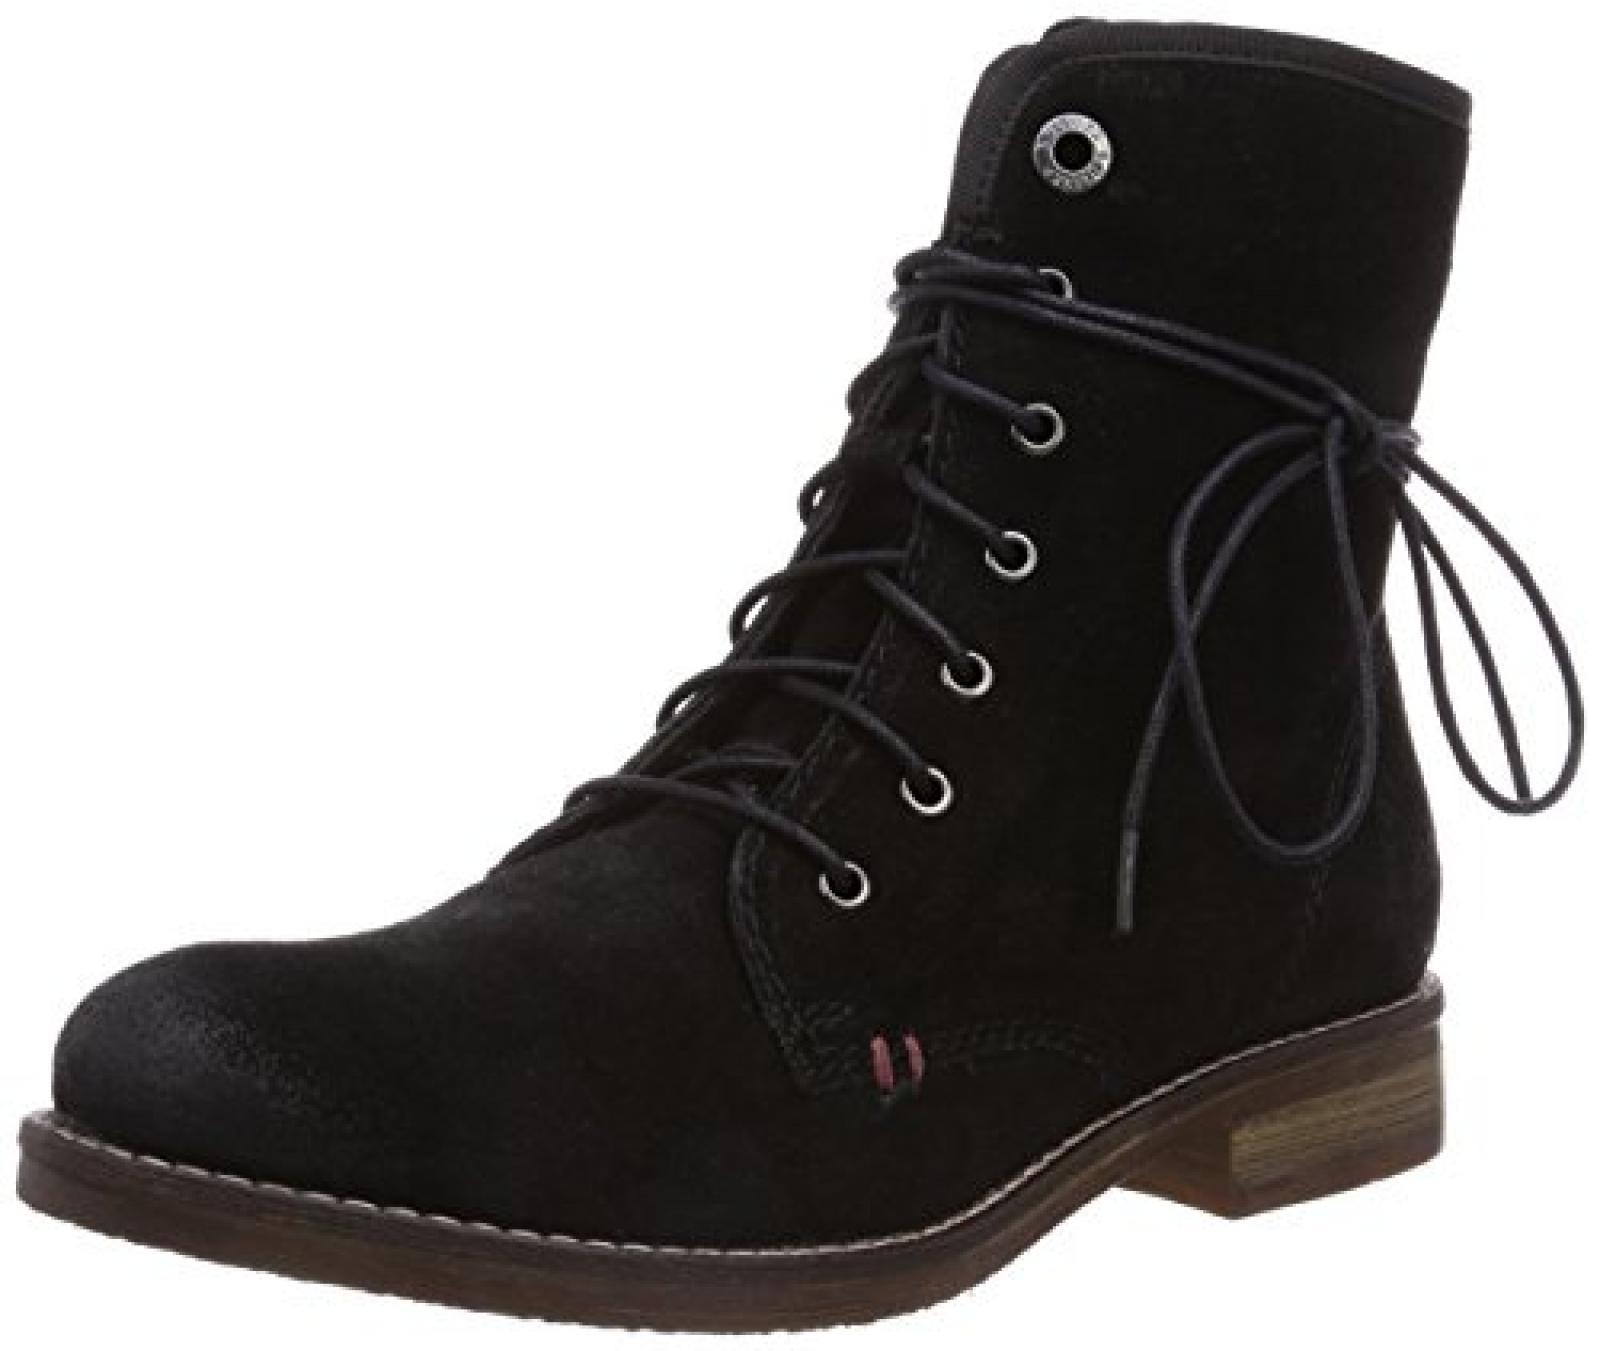 s.Oliver 25225 Damen Combat Boots